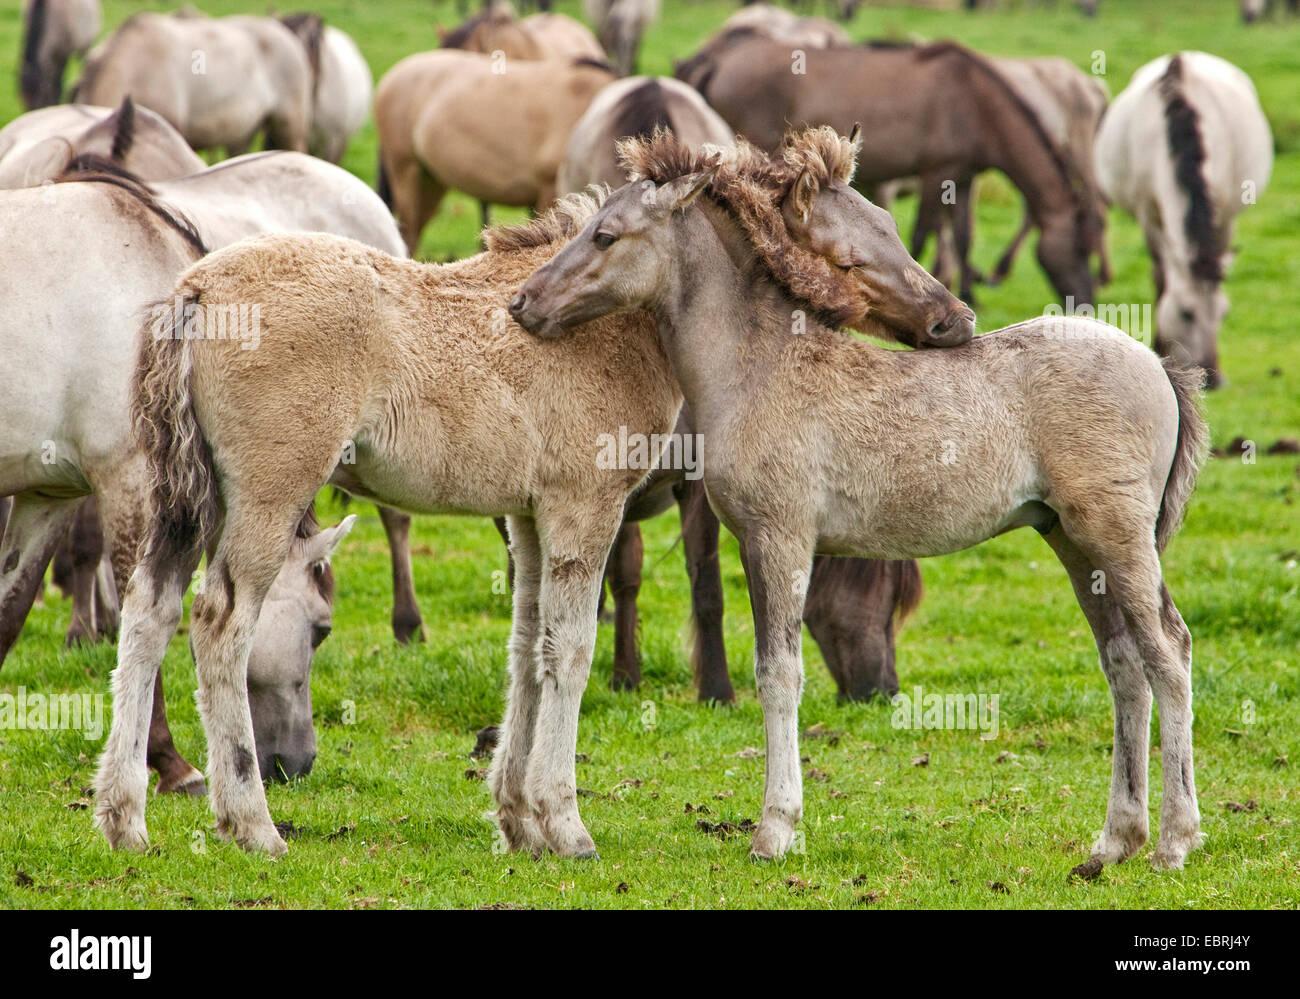 Duelmen pony, Dulmen pony, Duelmener Wildpferd, Dulmener Wildpferd (Equus przewalskii f. caballus), foals in the Stock Photo